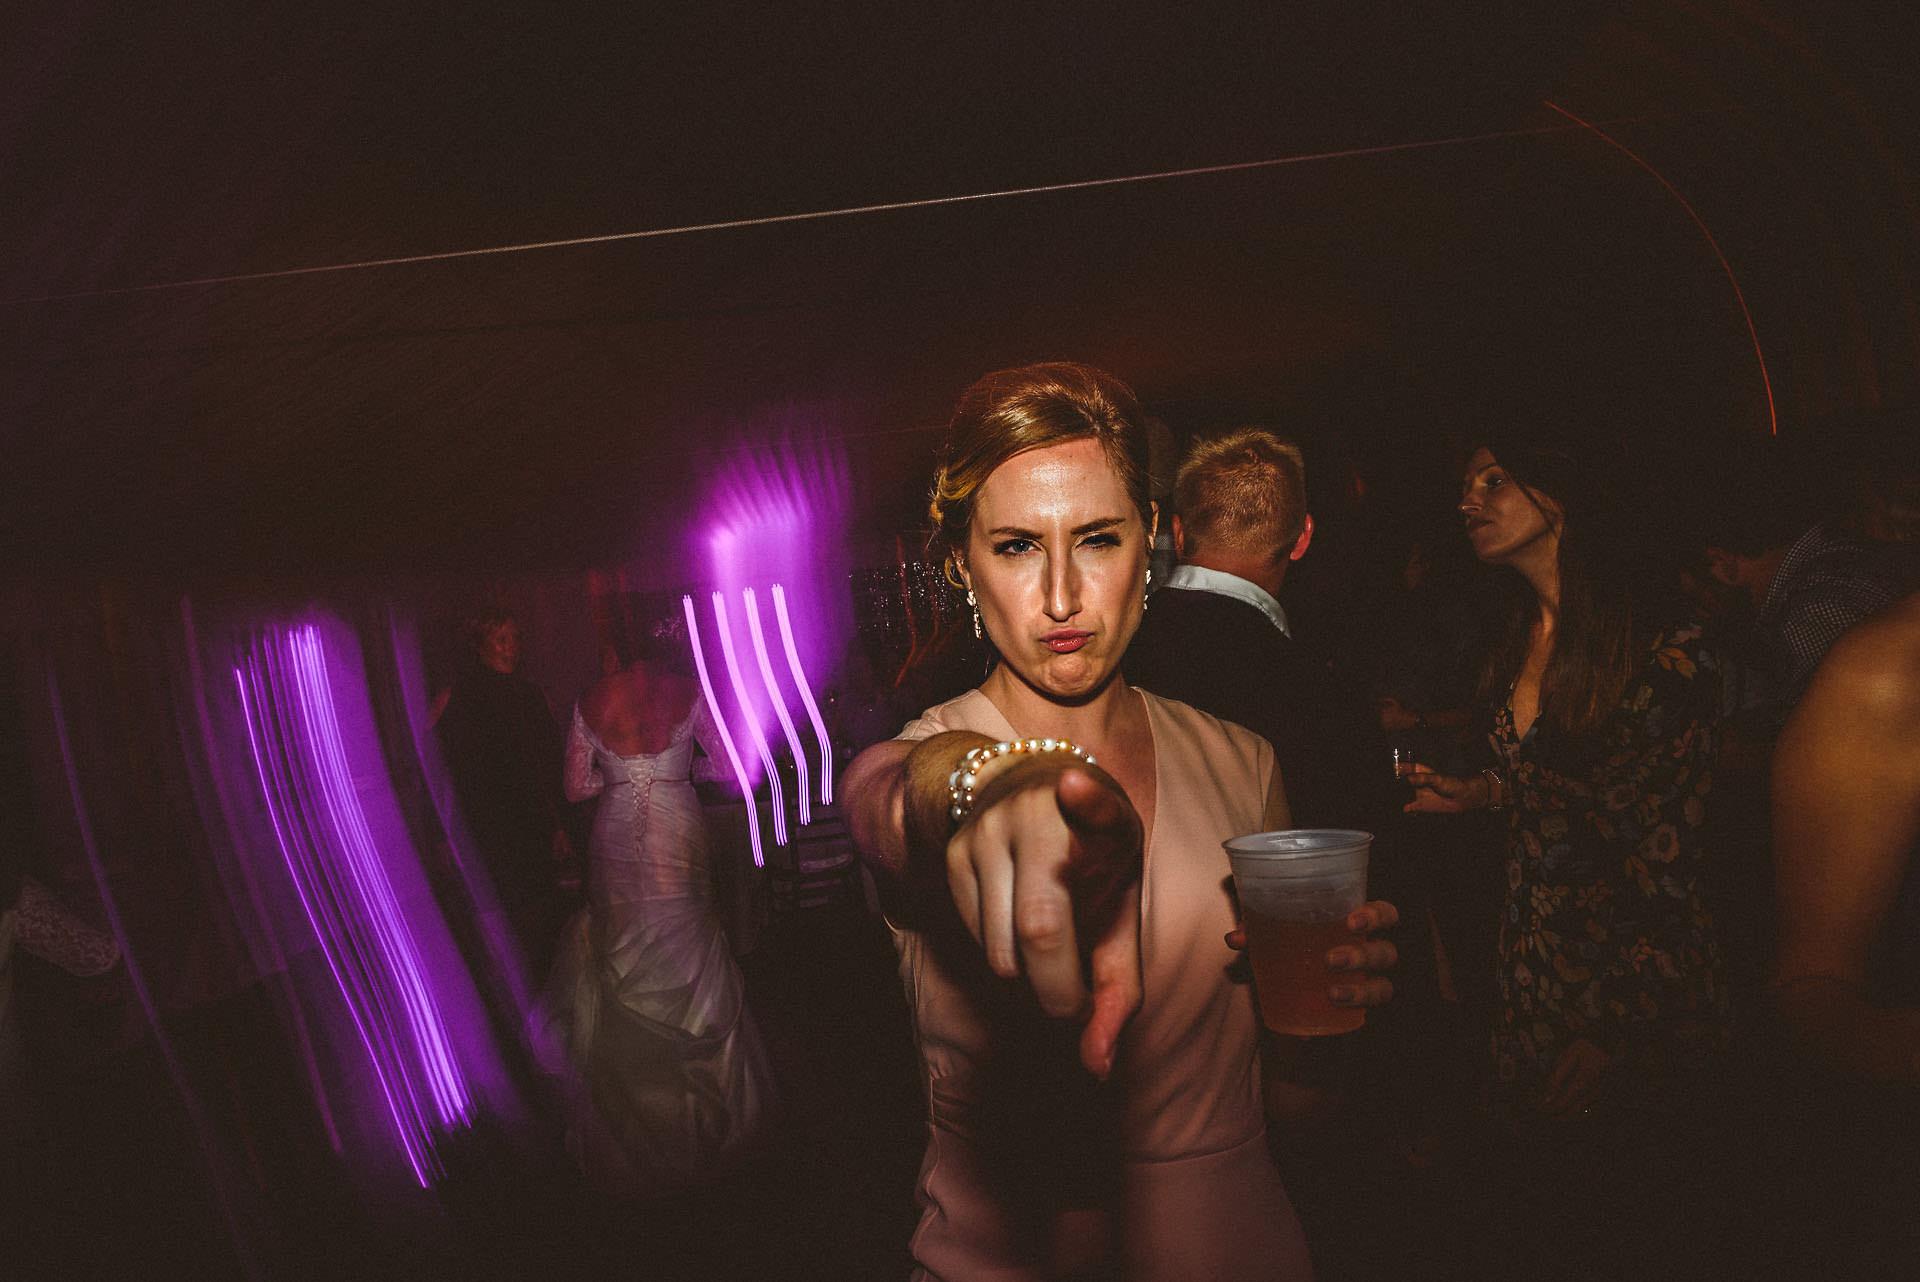 crazy dancing photographs